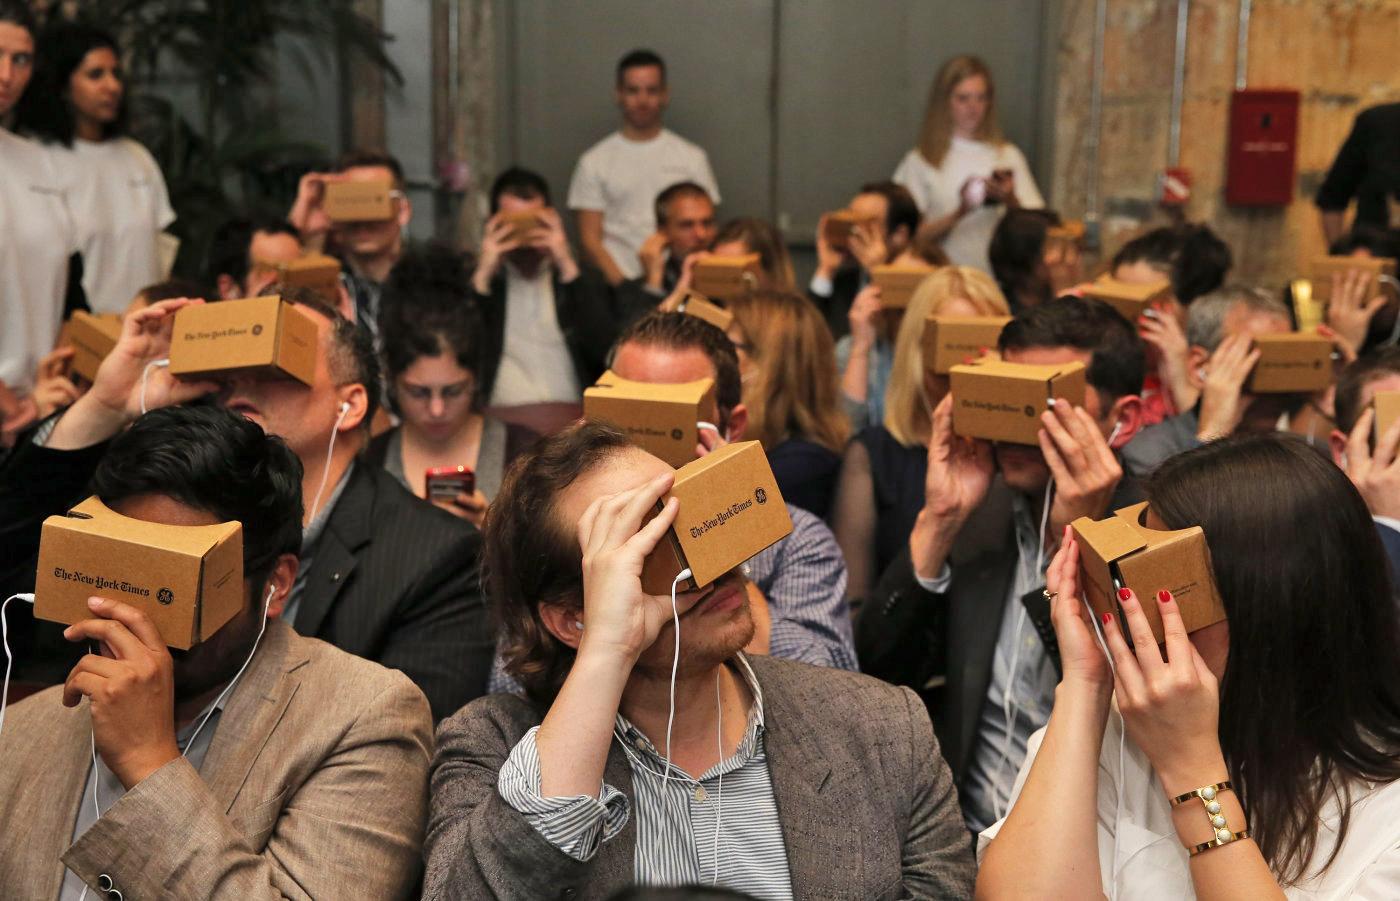 Google ha vendido 5 millones de gafas VR de cartón